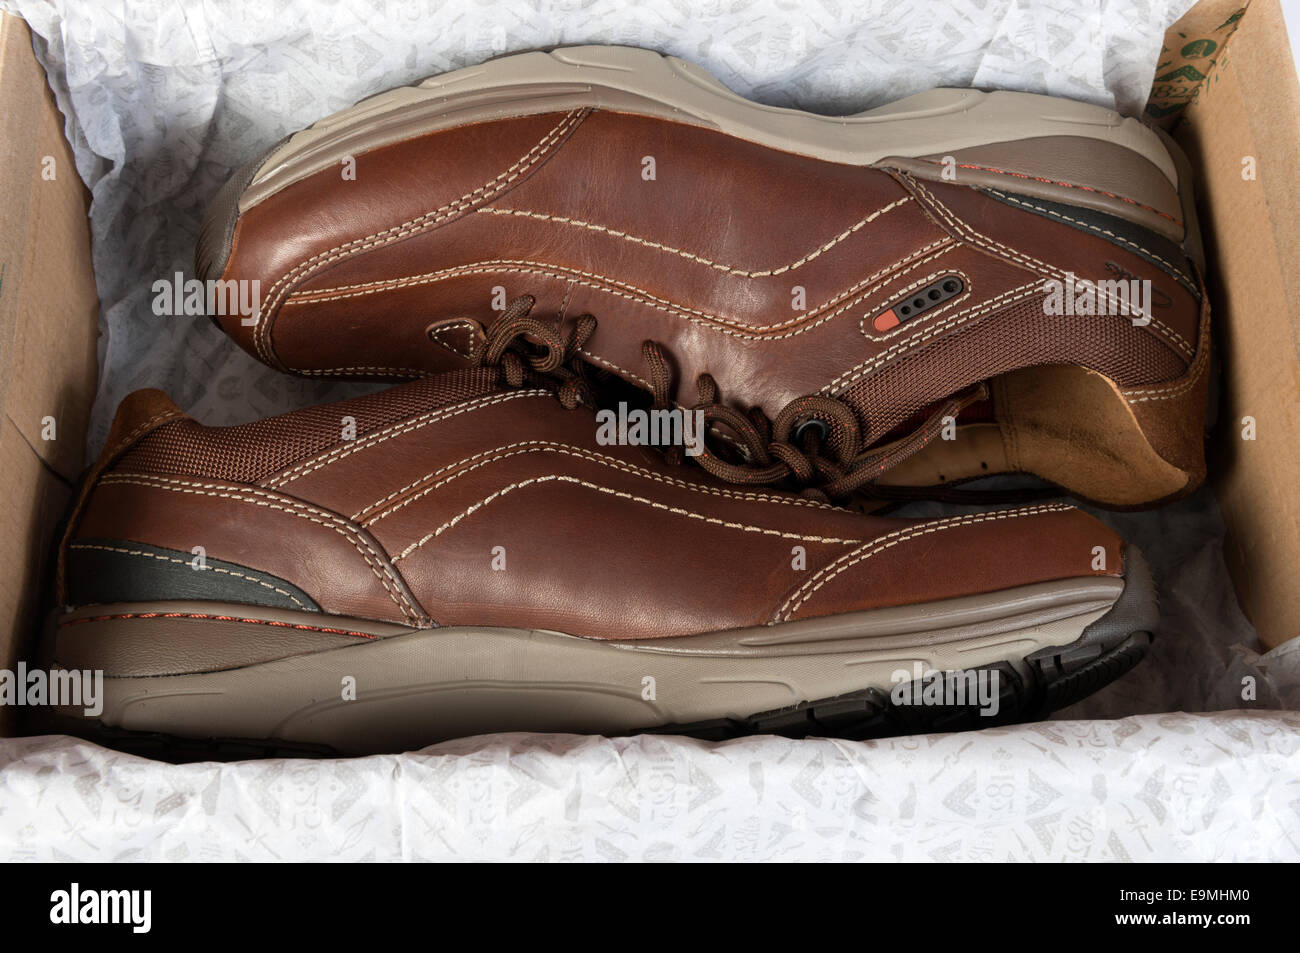 Herren Clarks Active Air Schuhe Stockfoto, Bild: 74826304